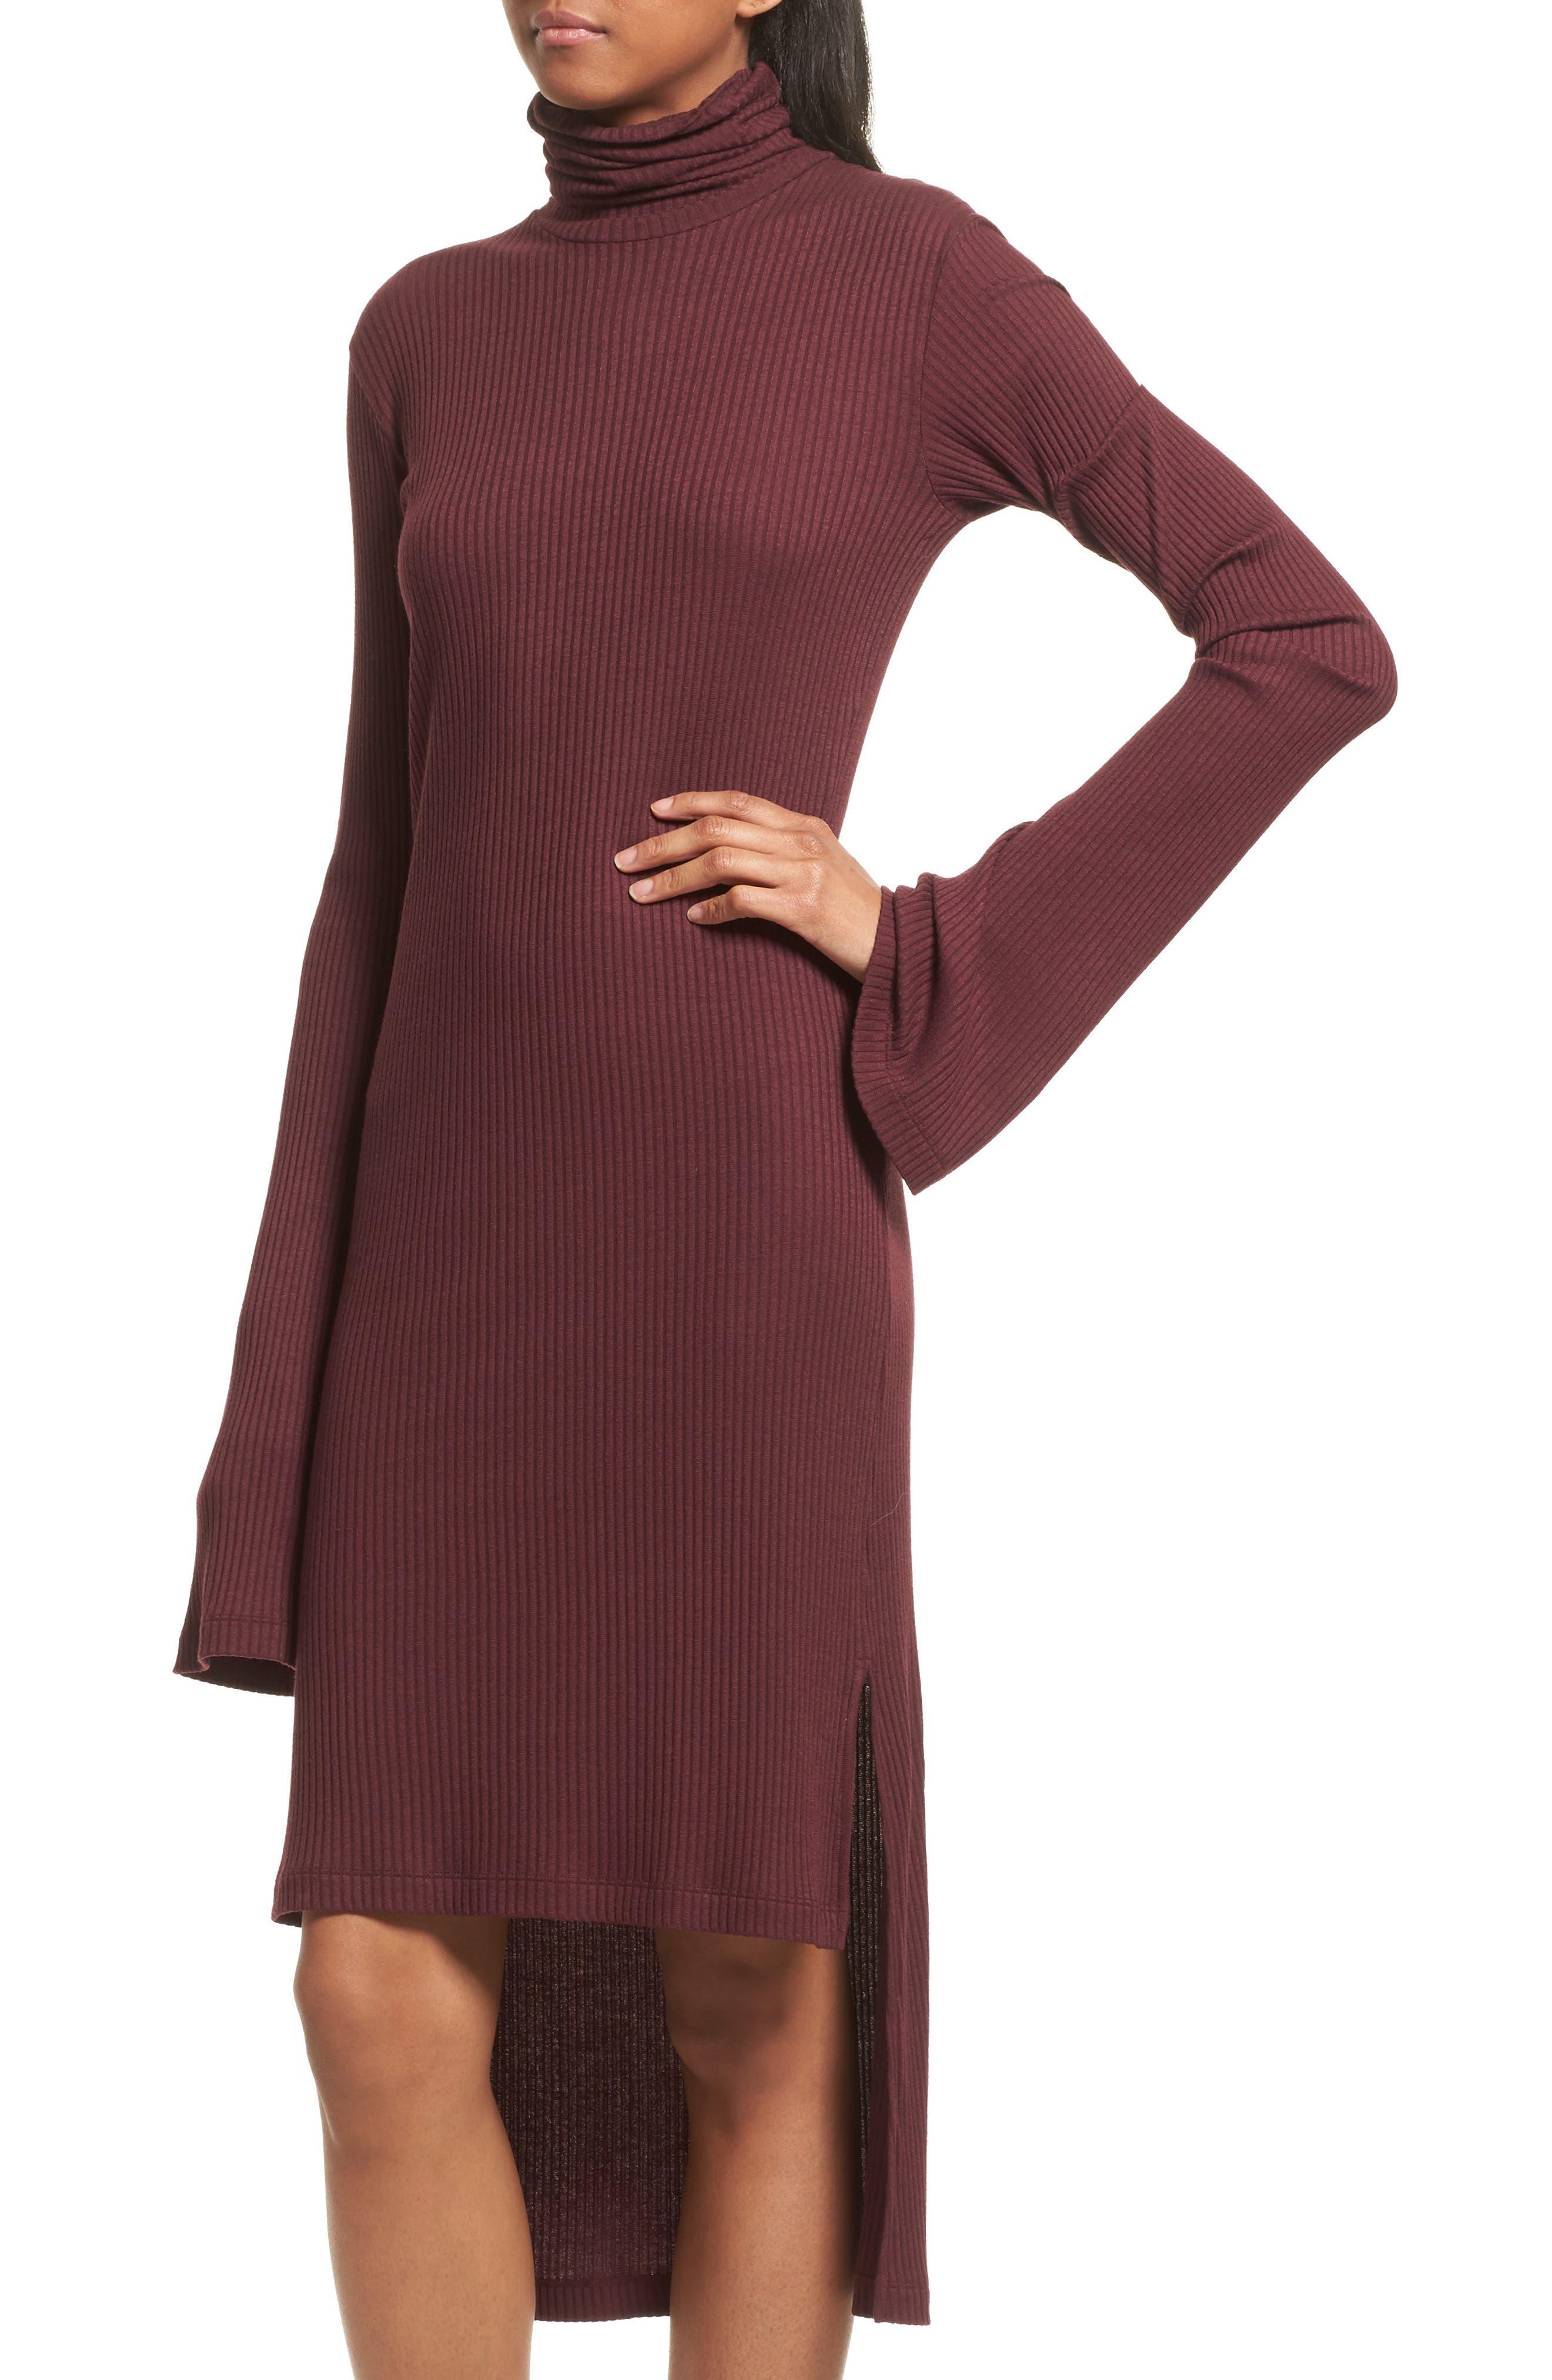 Step Hem Turtleneck Dress,                             Alternate thumbnail 4, color,                             931